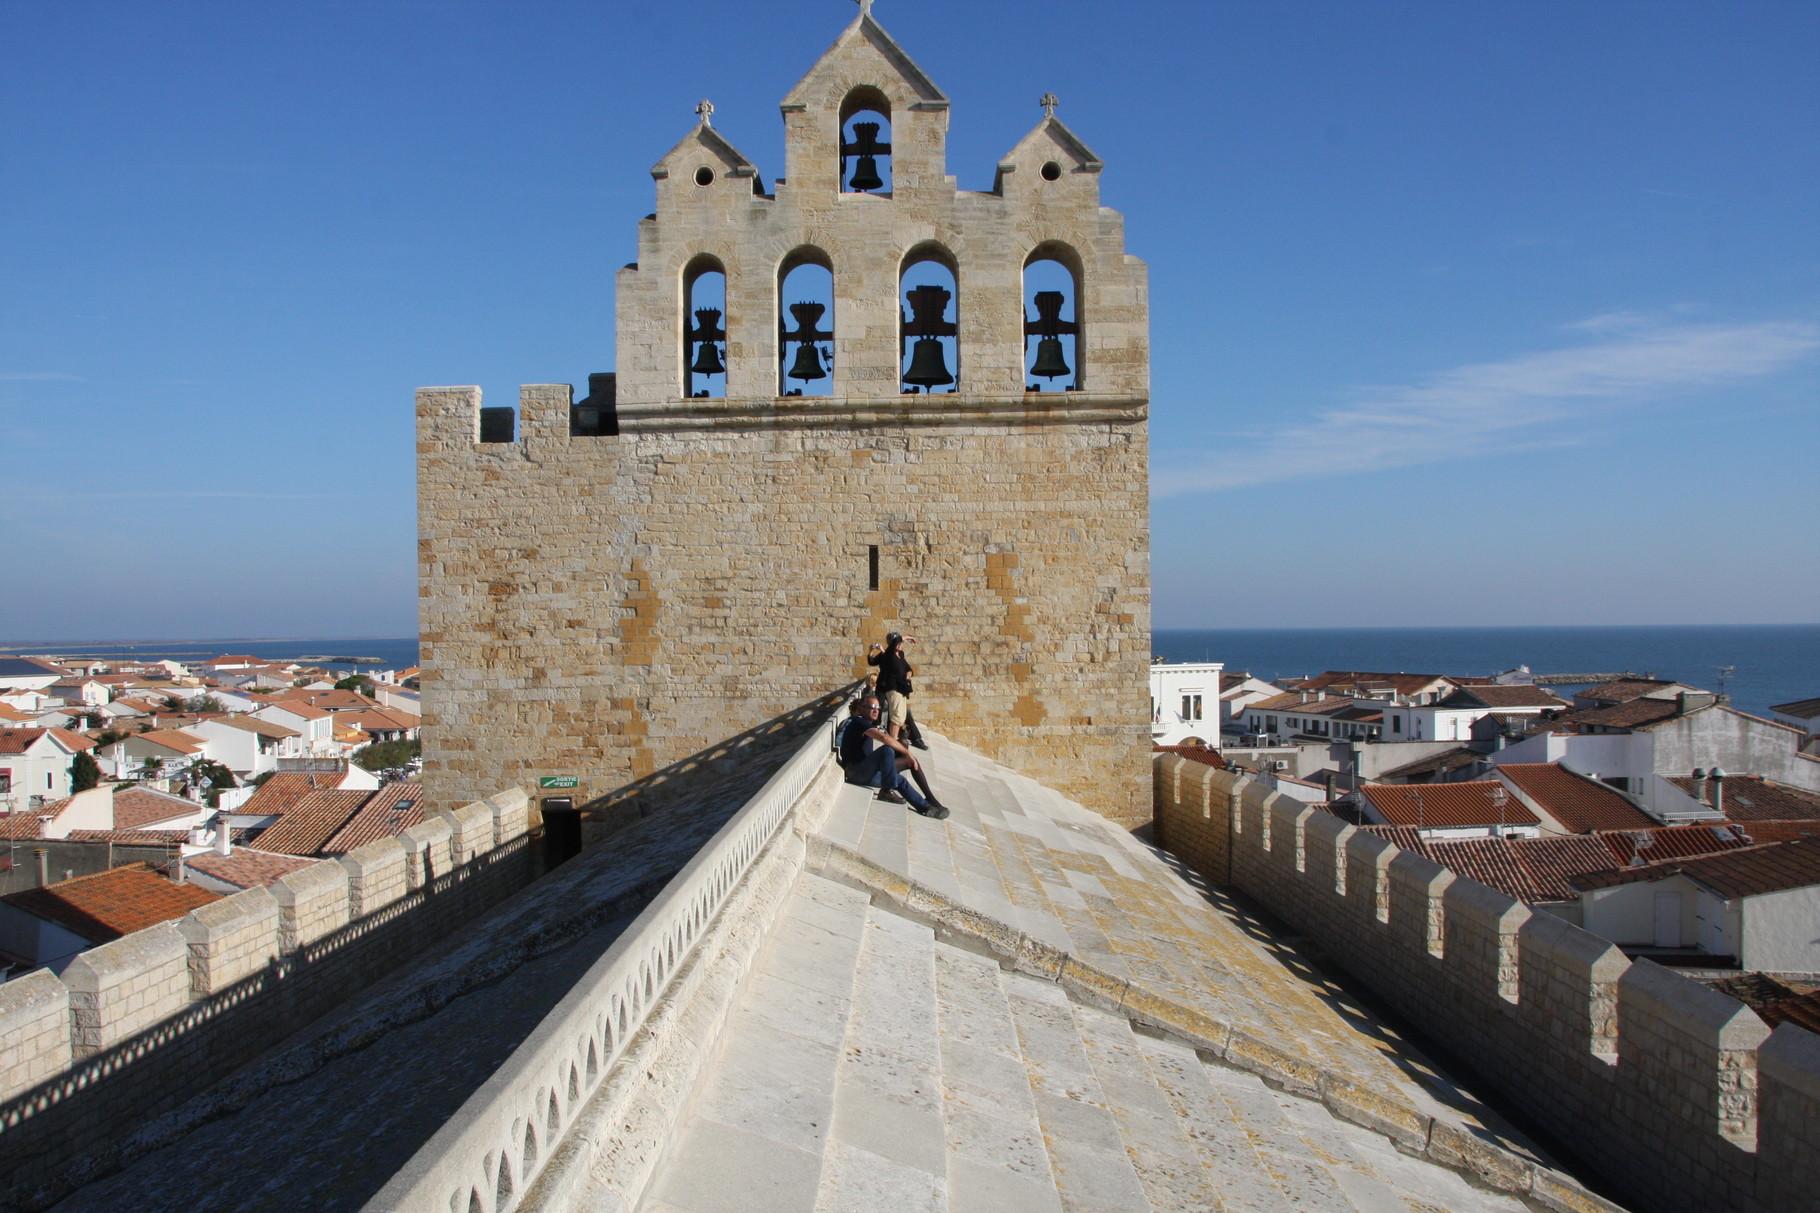 Saintes-Maries-de-la-Mer - provence in wort und bild